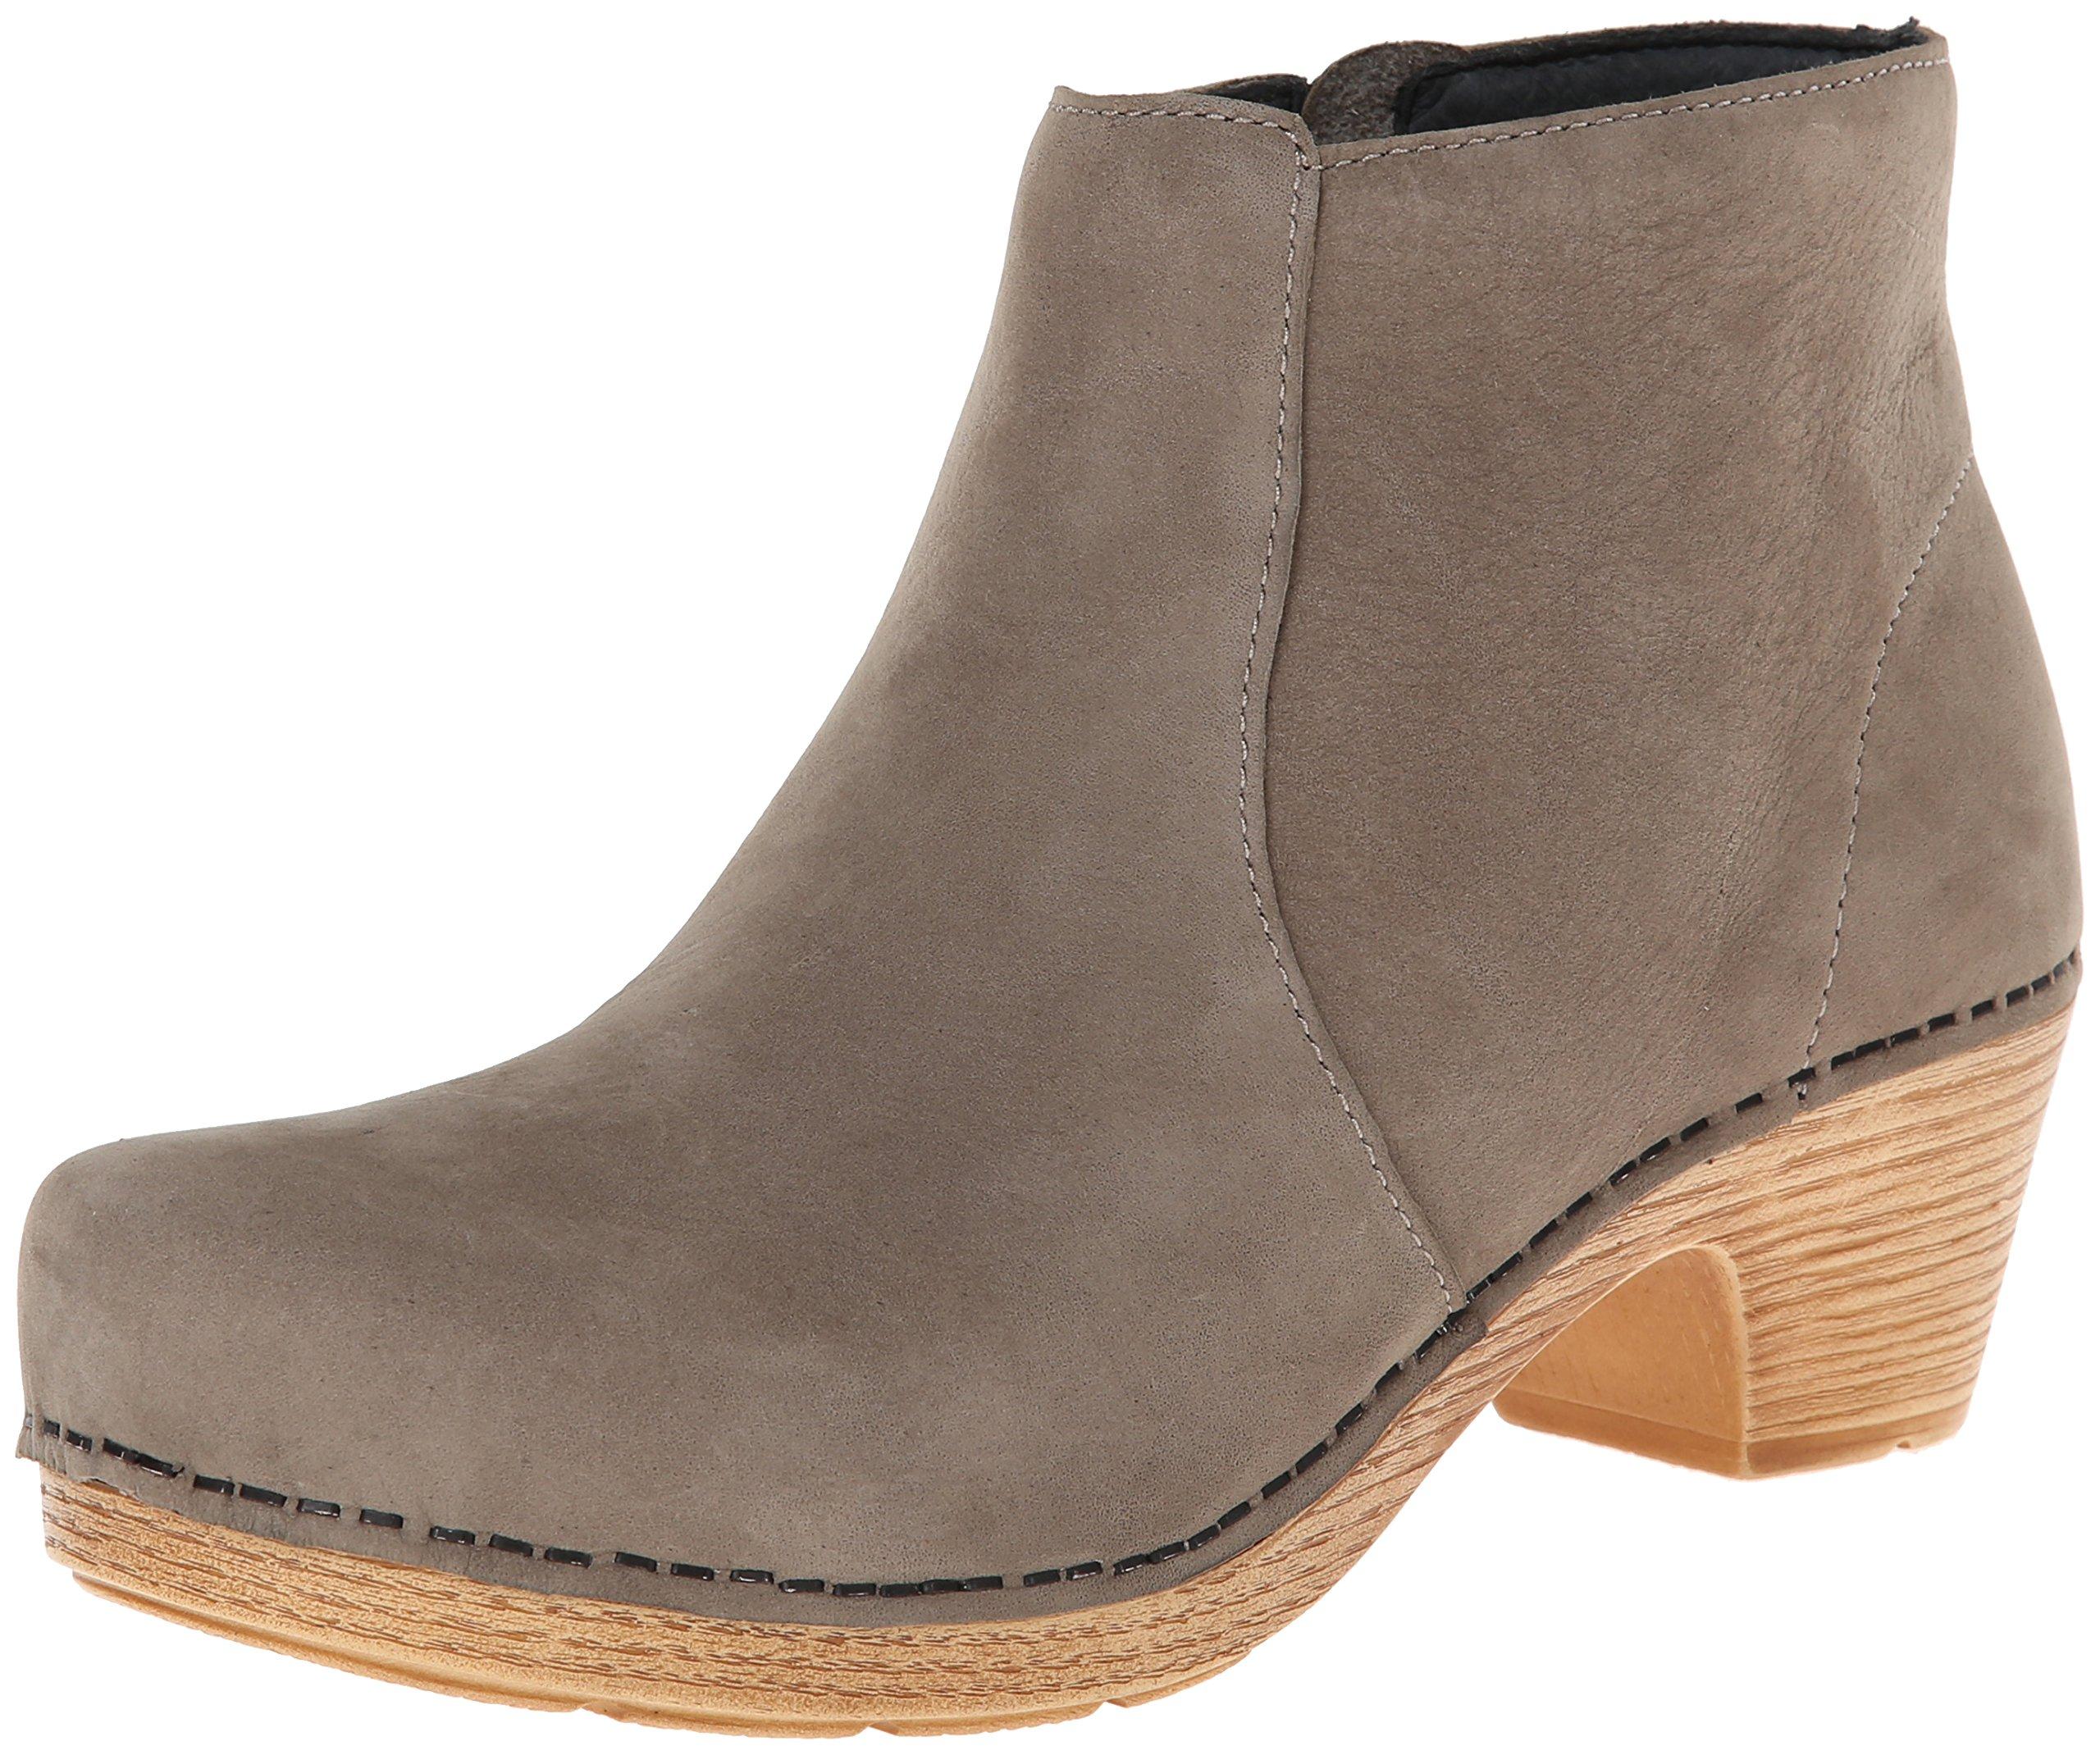 Dansko Women's Maria Boot, Taupe Milled Nubuck, 37 BR/6.5-7 M US